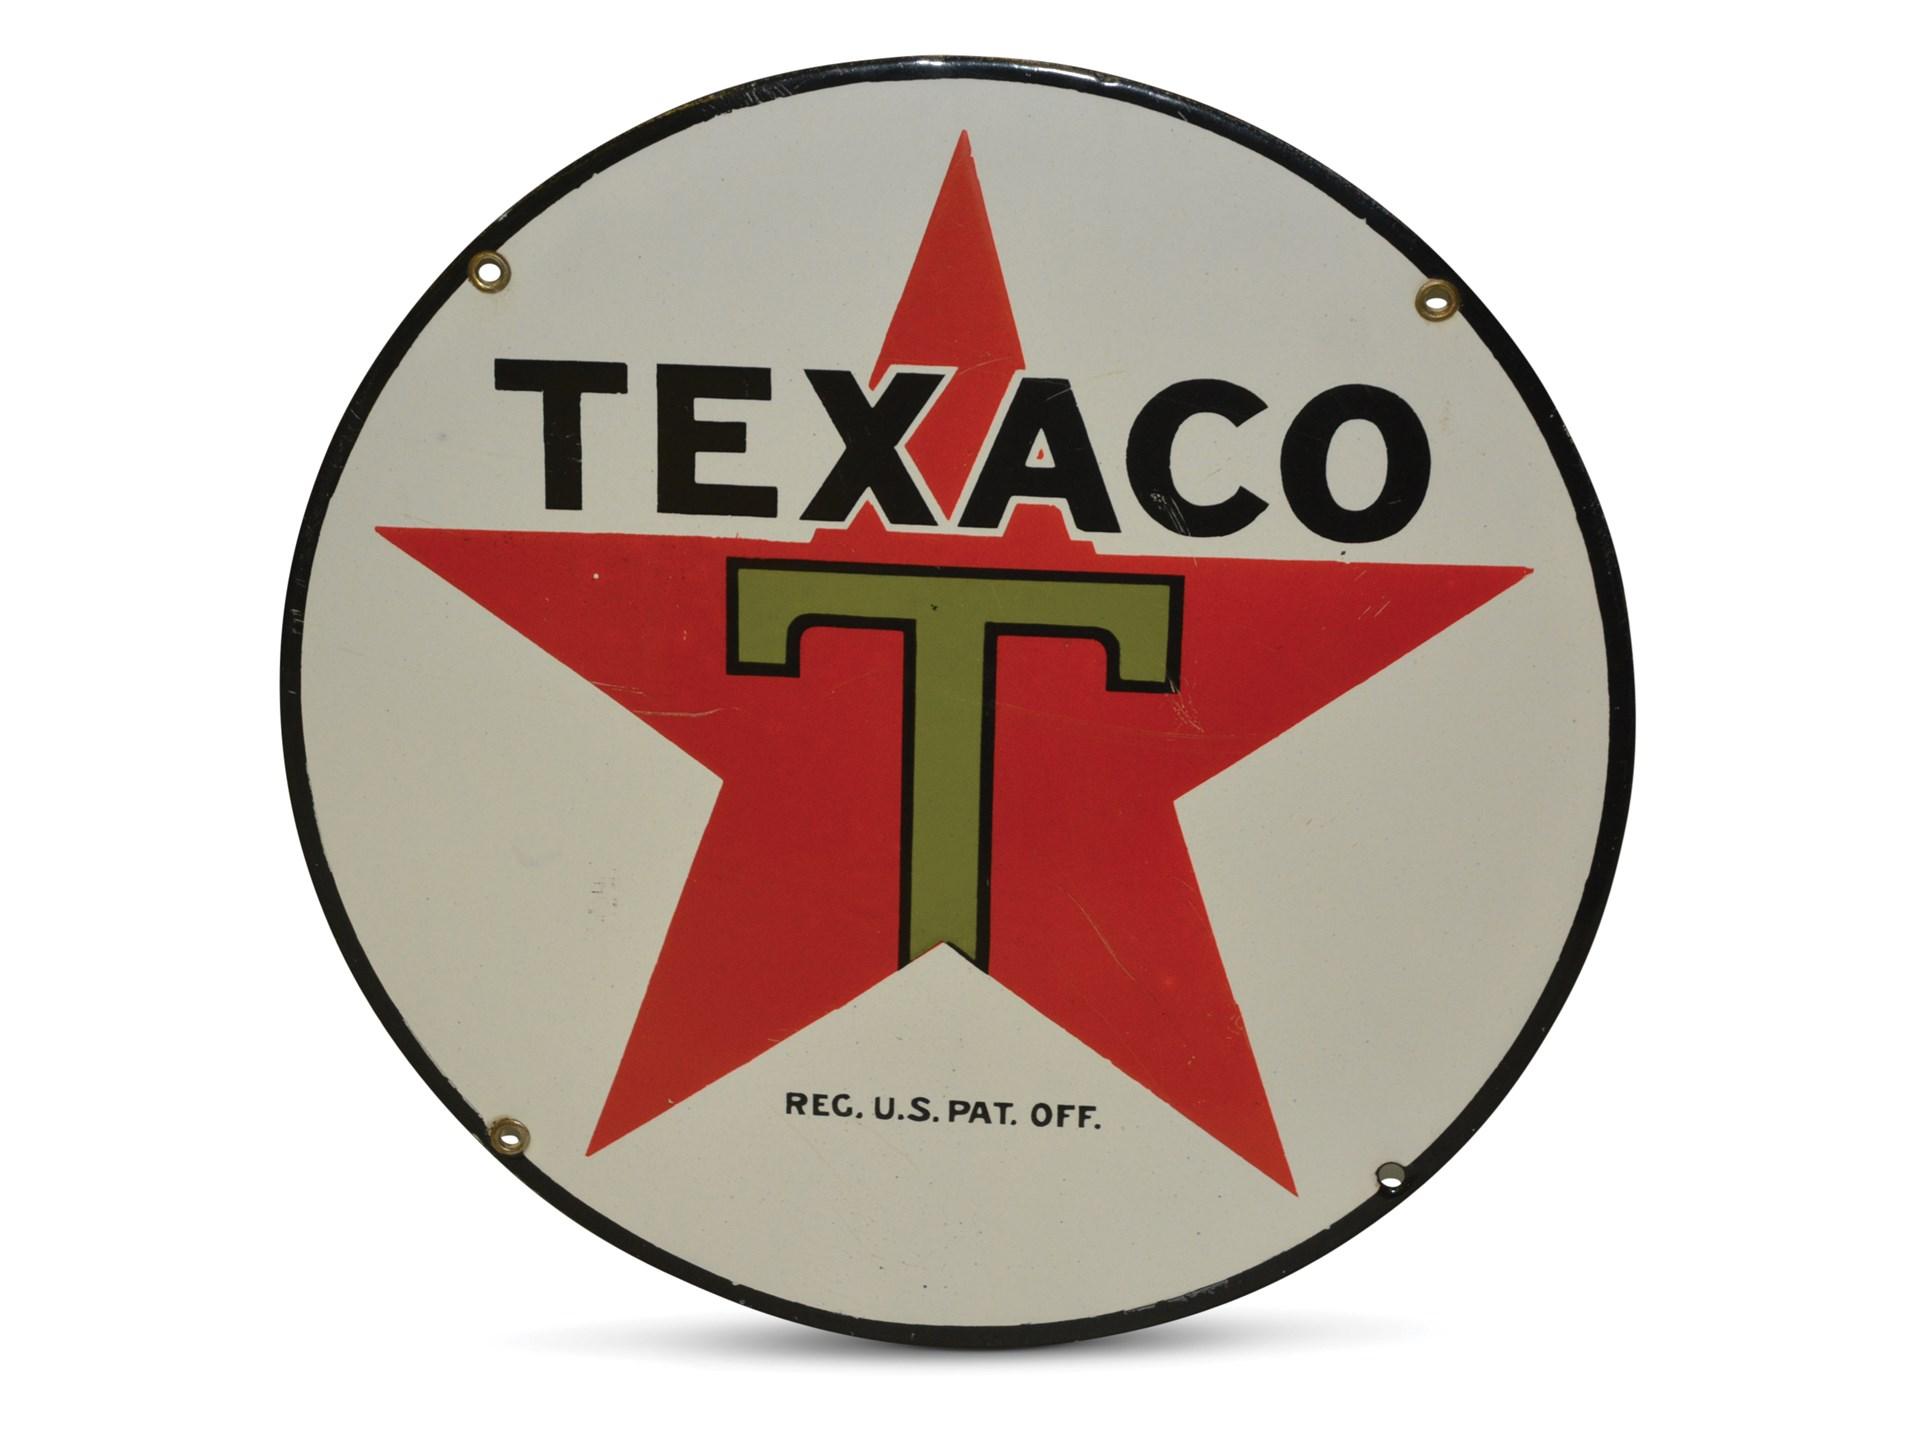 RM Sotheby's - Texaco 'Black-T' Star Logo Large Porcelain